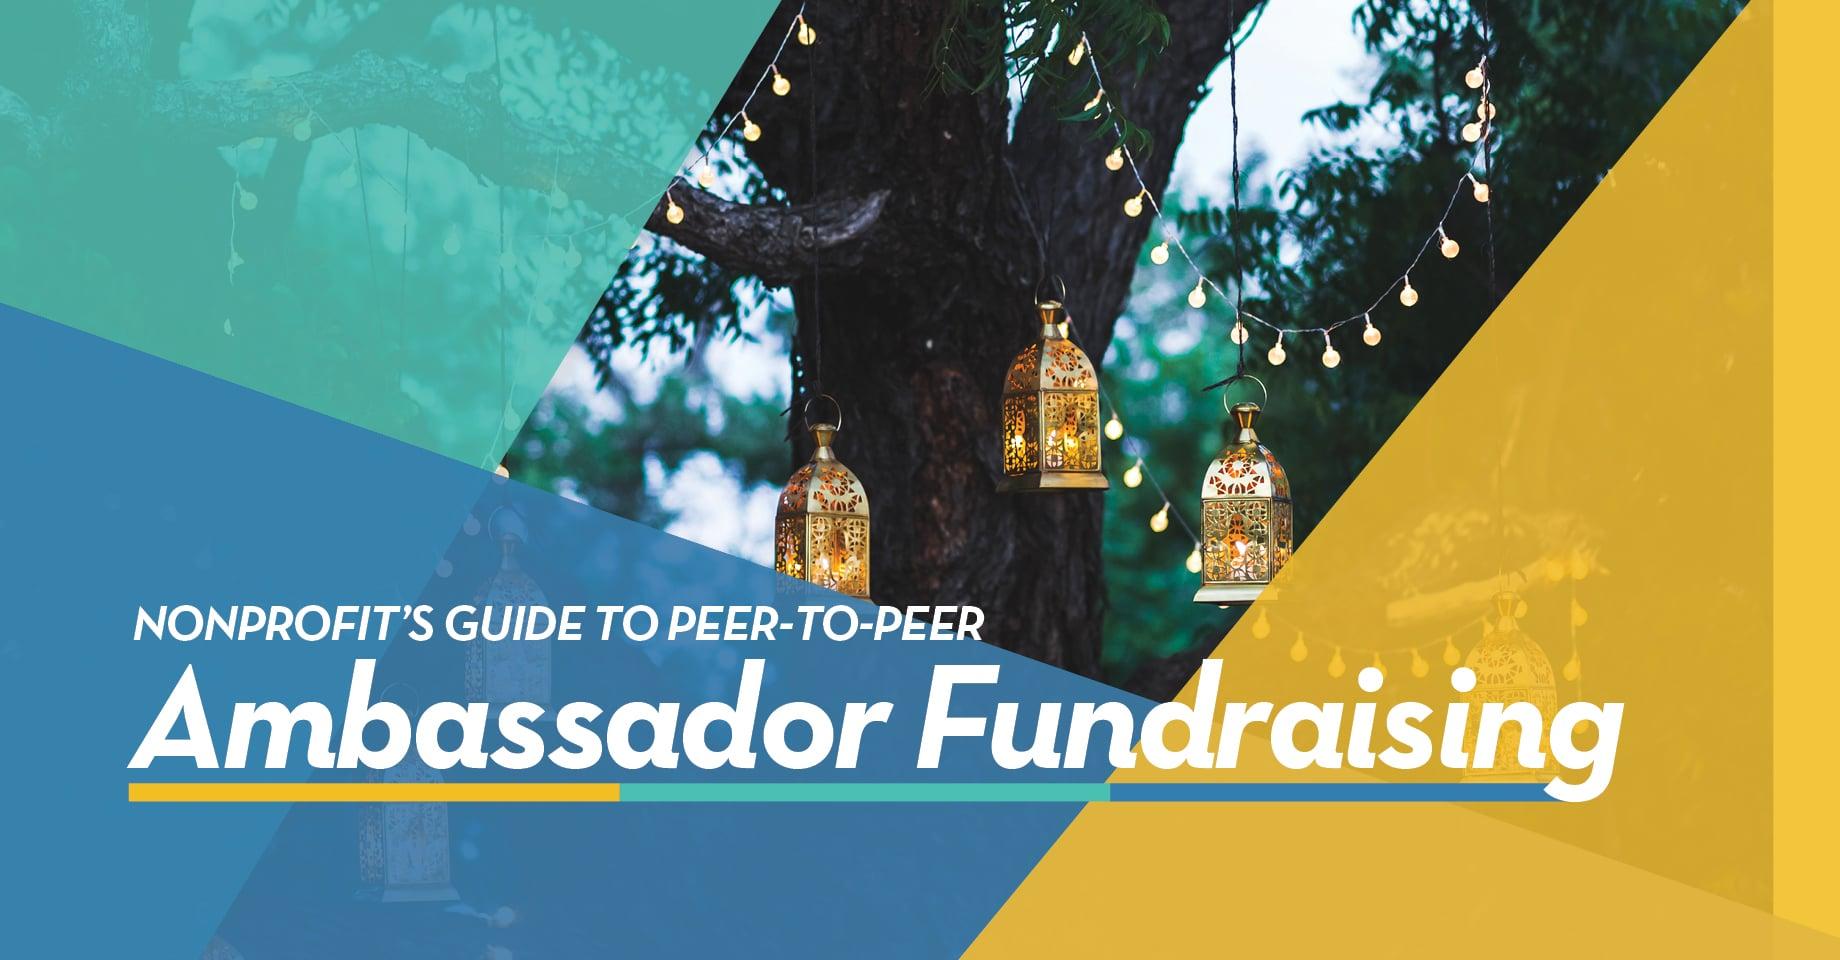 Nonprofit Guide to Peer-to-Peer Ambassador Fundraising